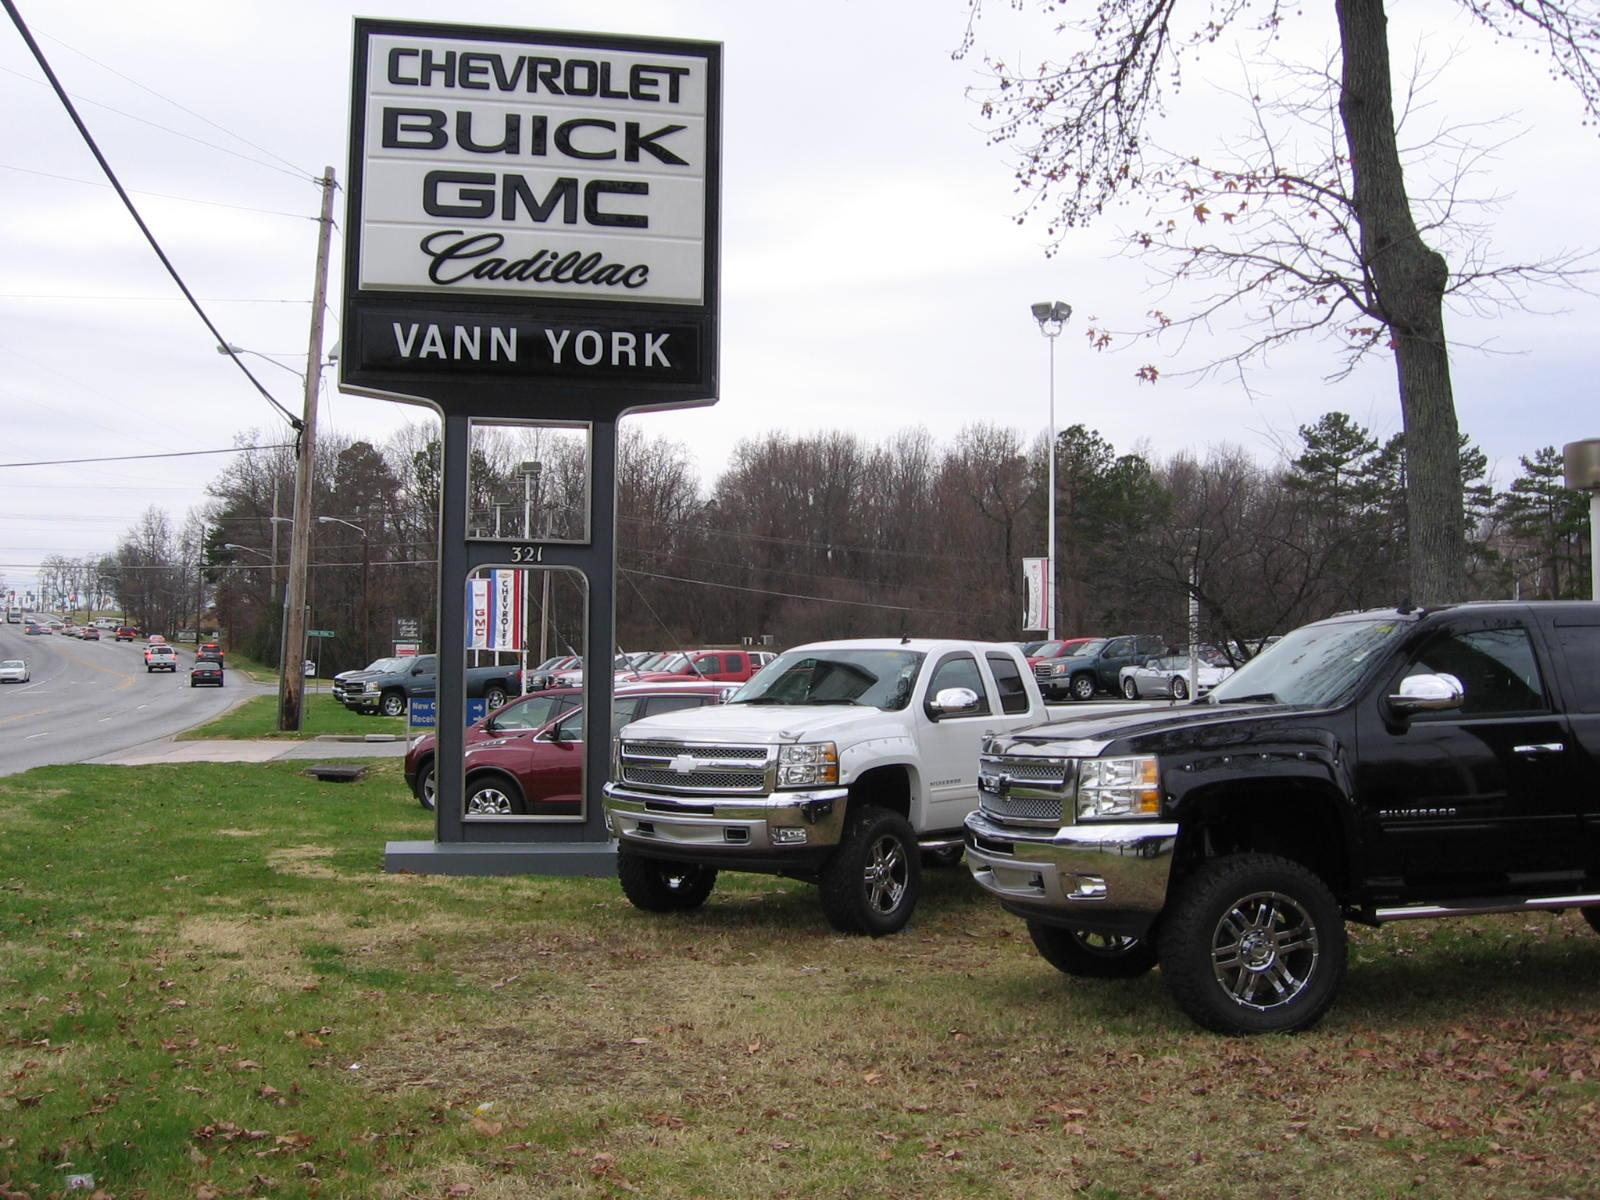 Vann York Gmc >> Vann York Chevrolet Buick GMC Cadillac: Rocky Ridge Edition Chevrolet Silverados! Vann York ...